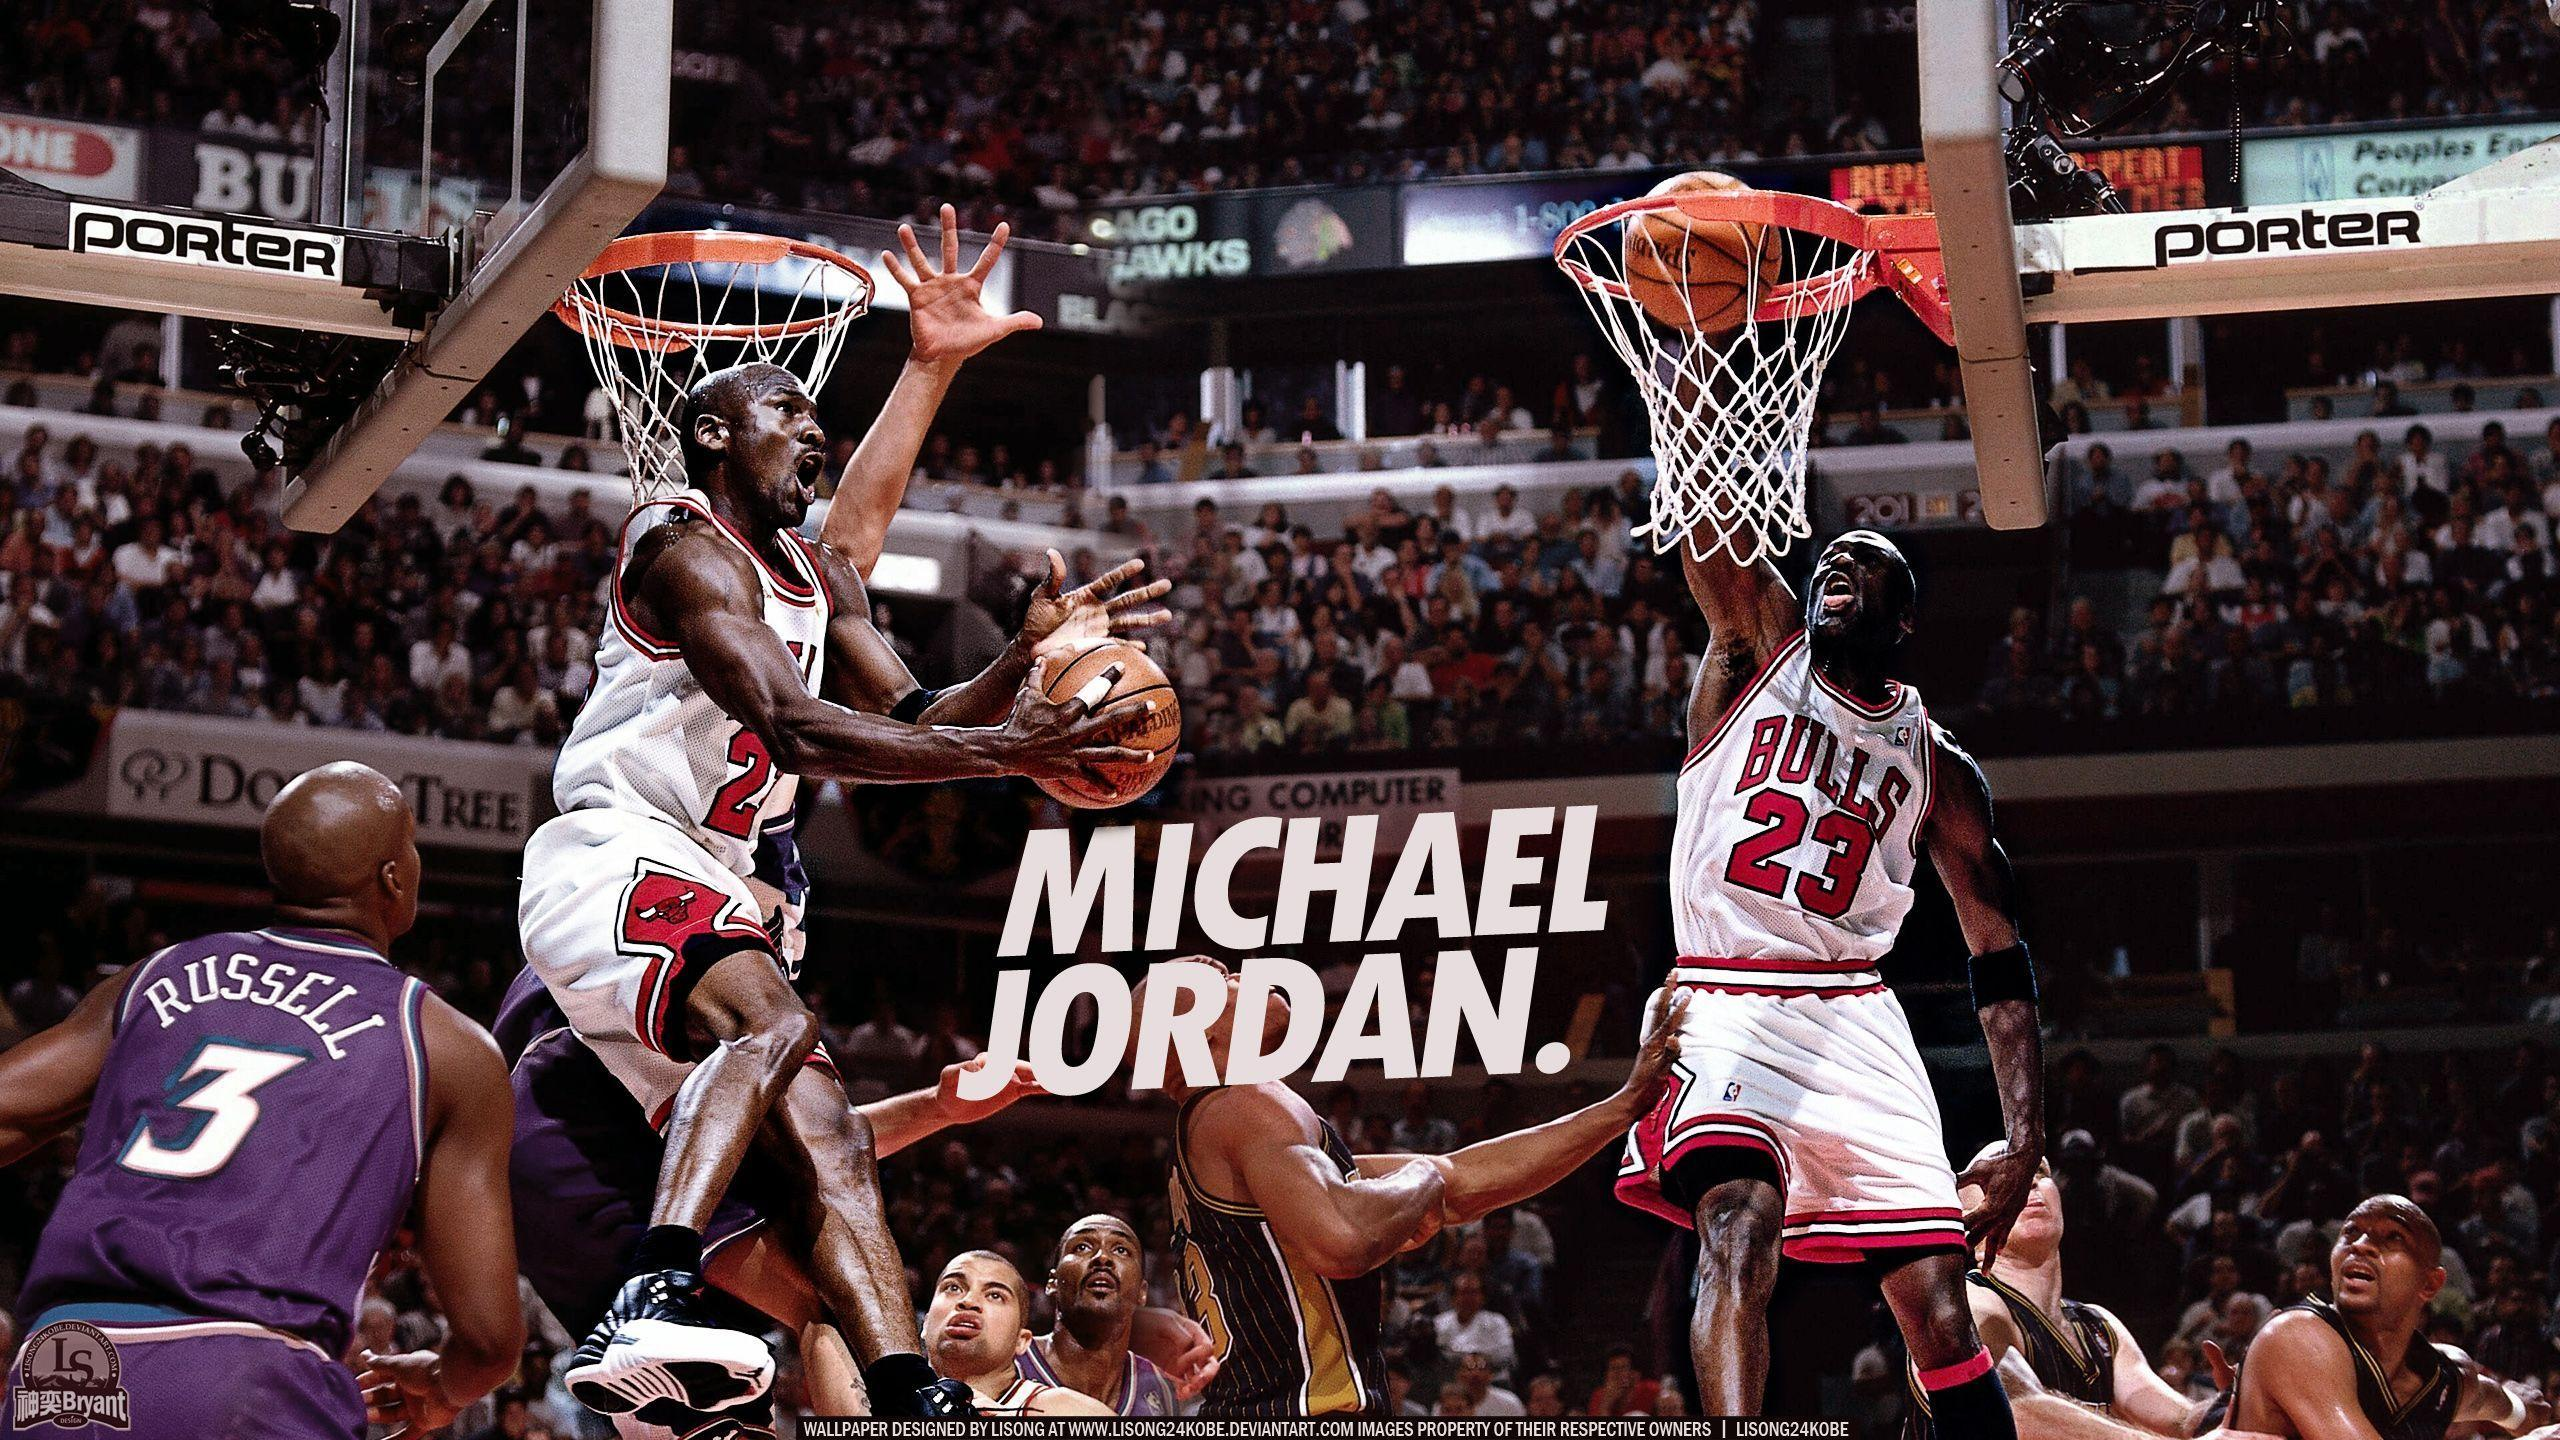 839767babf3 Michael Jordan Wallpapers Free Throw Dunk - Wallpaper Cave